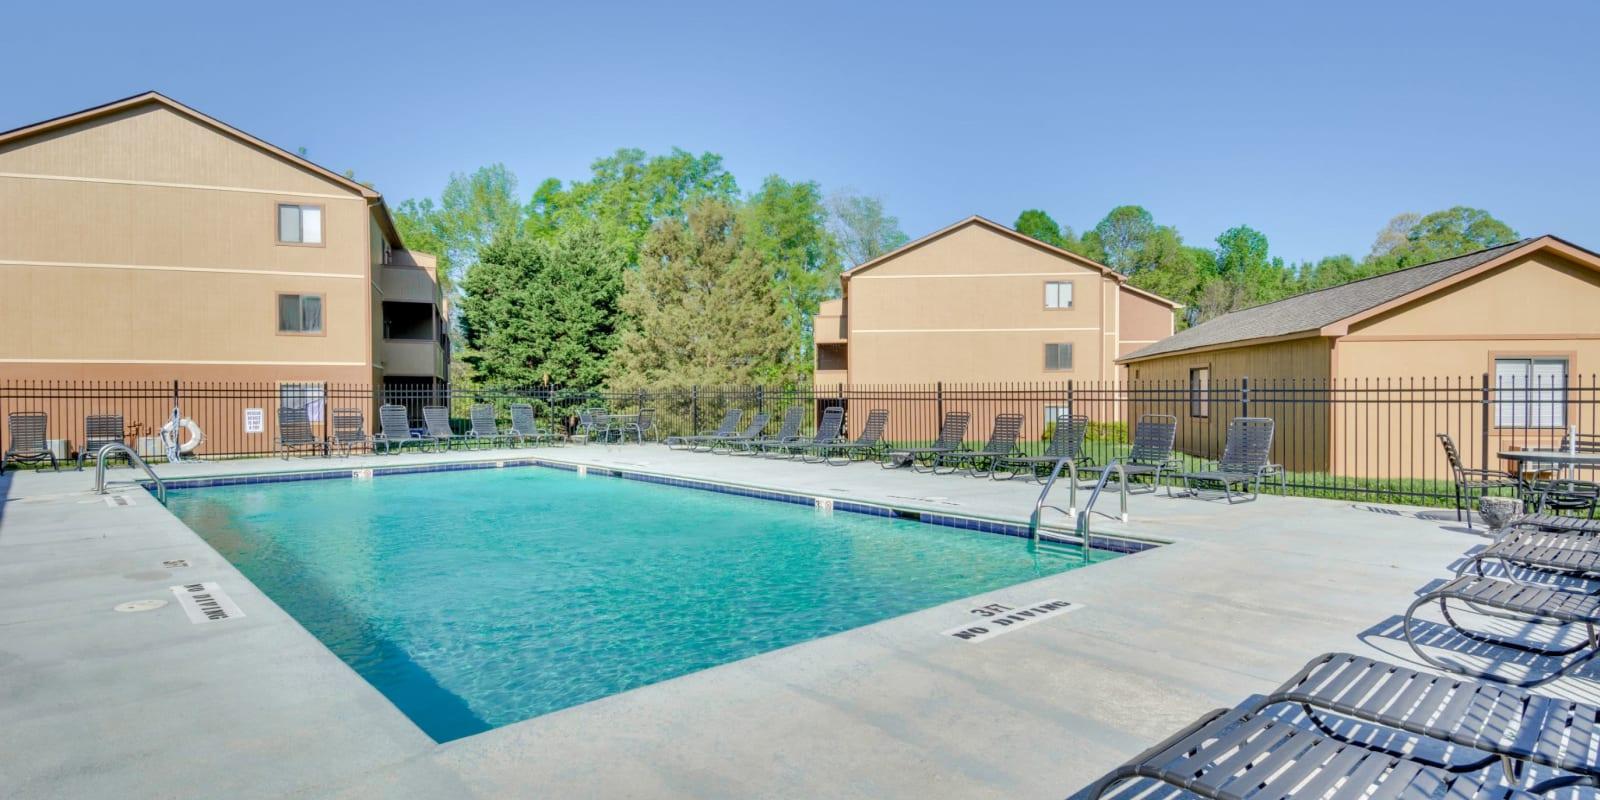 A large swimming pool for hot summer days at Woodbrook Apartment Homes in Monroe, North Carolina